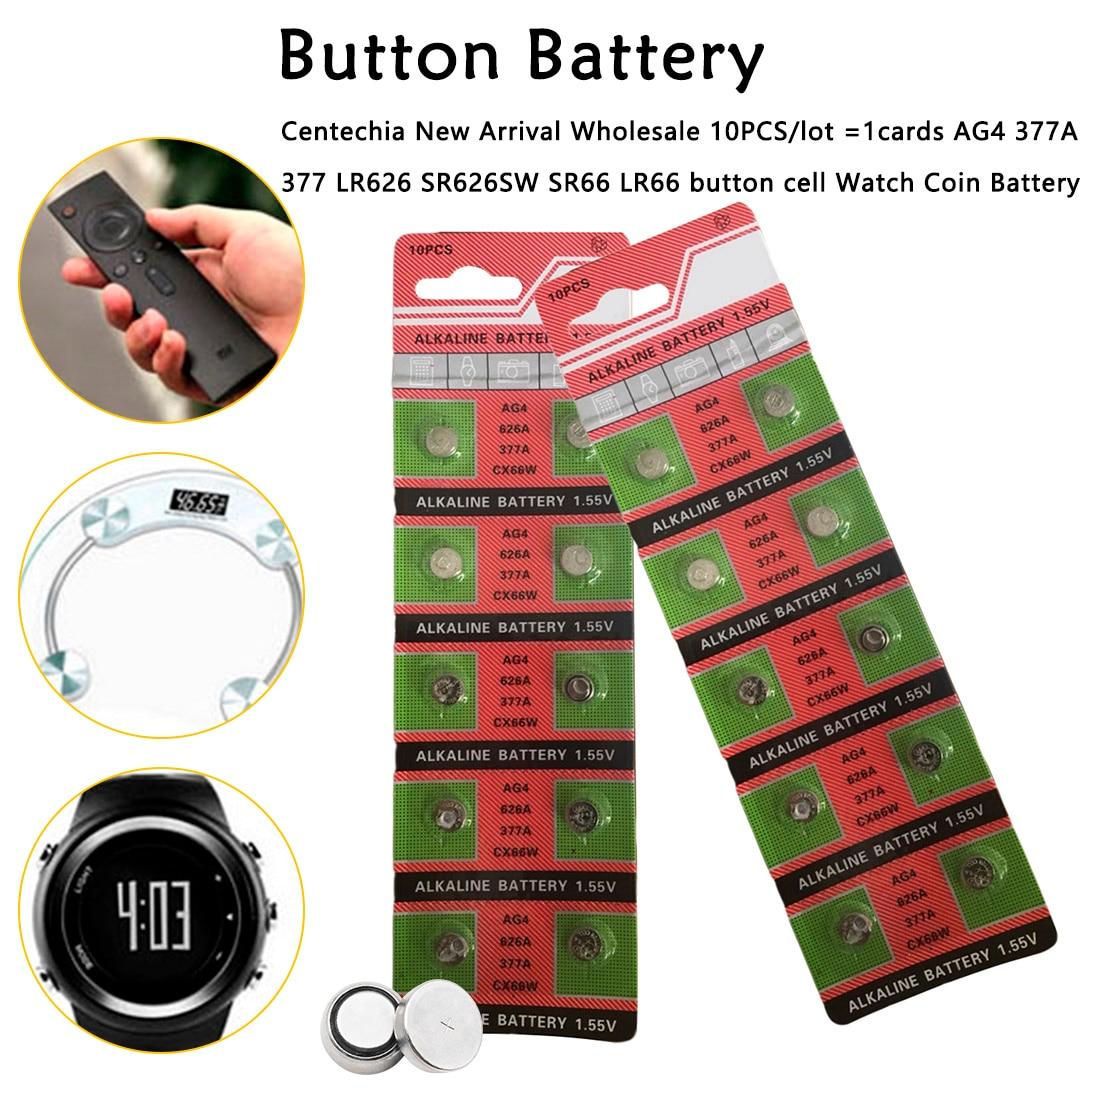 Poderoso 10 Uds x AG4 377A 377 LR626 SR626SW SR66 LR66 reloj batería Tianqiu la marca de baterías